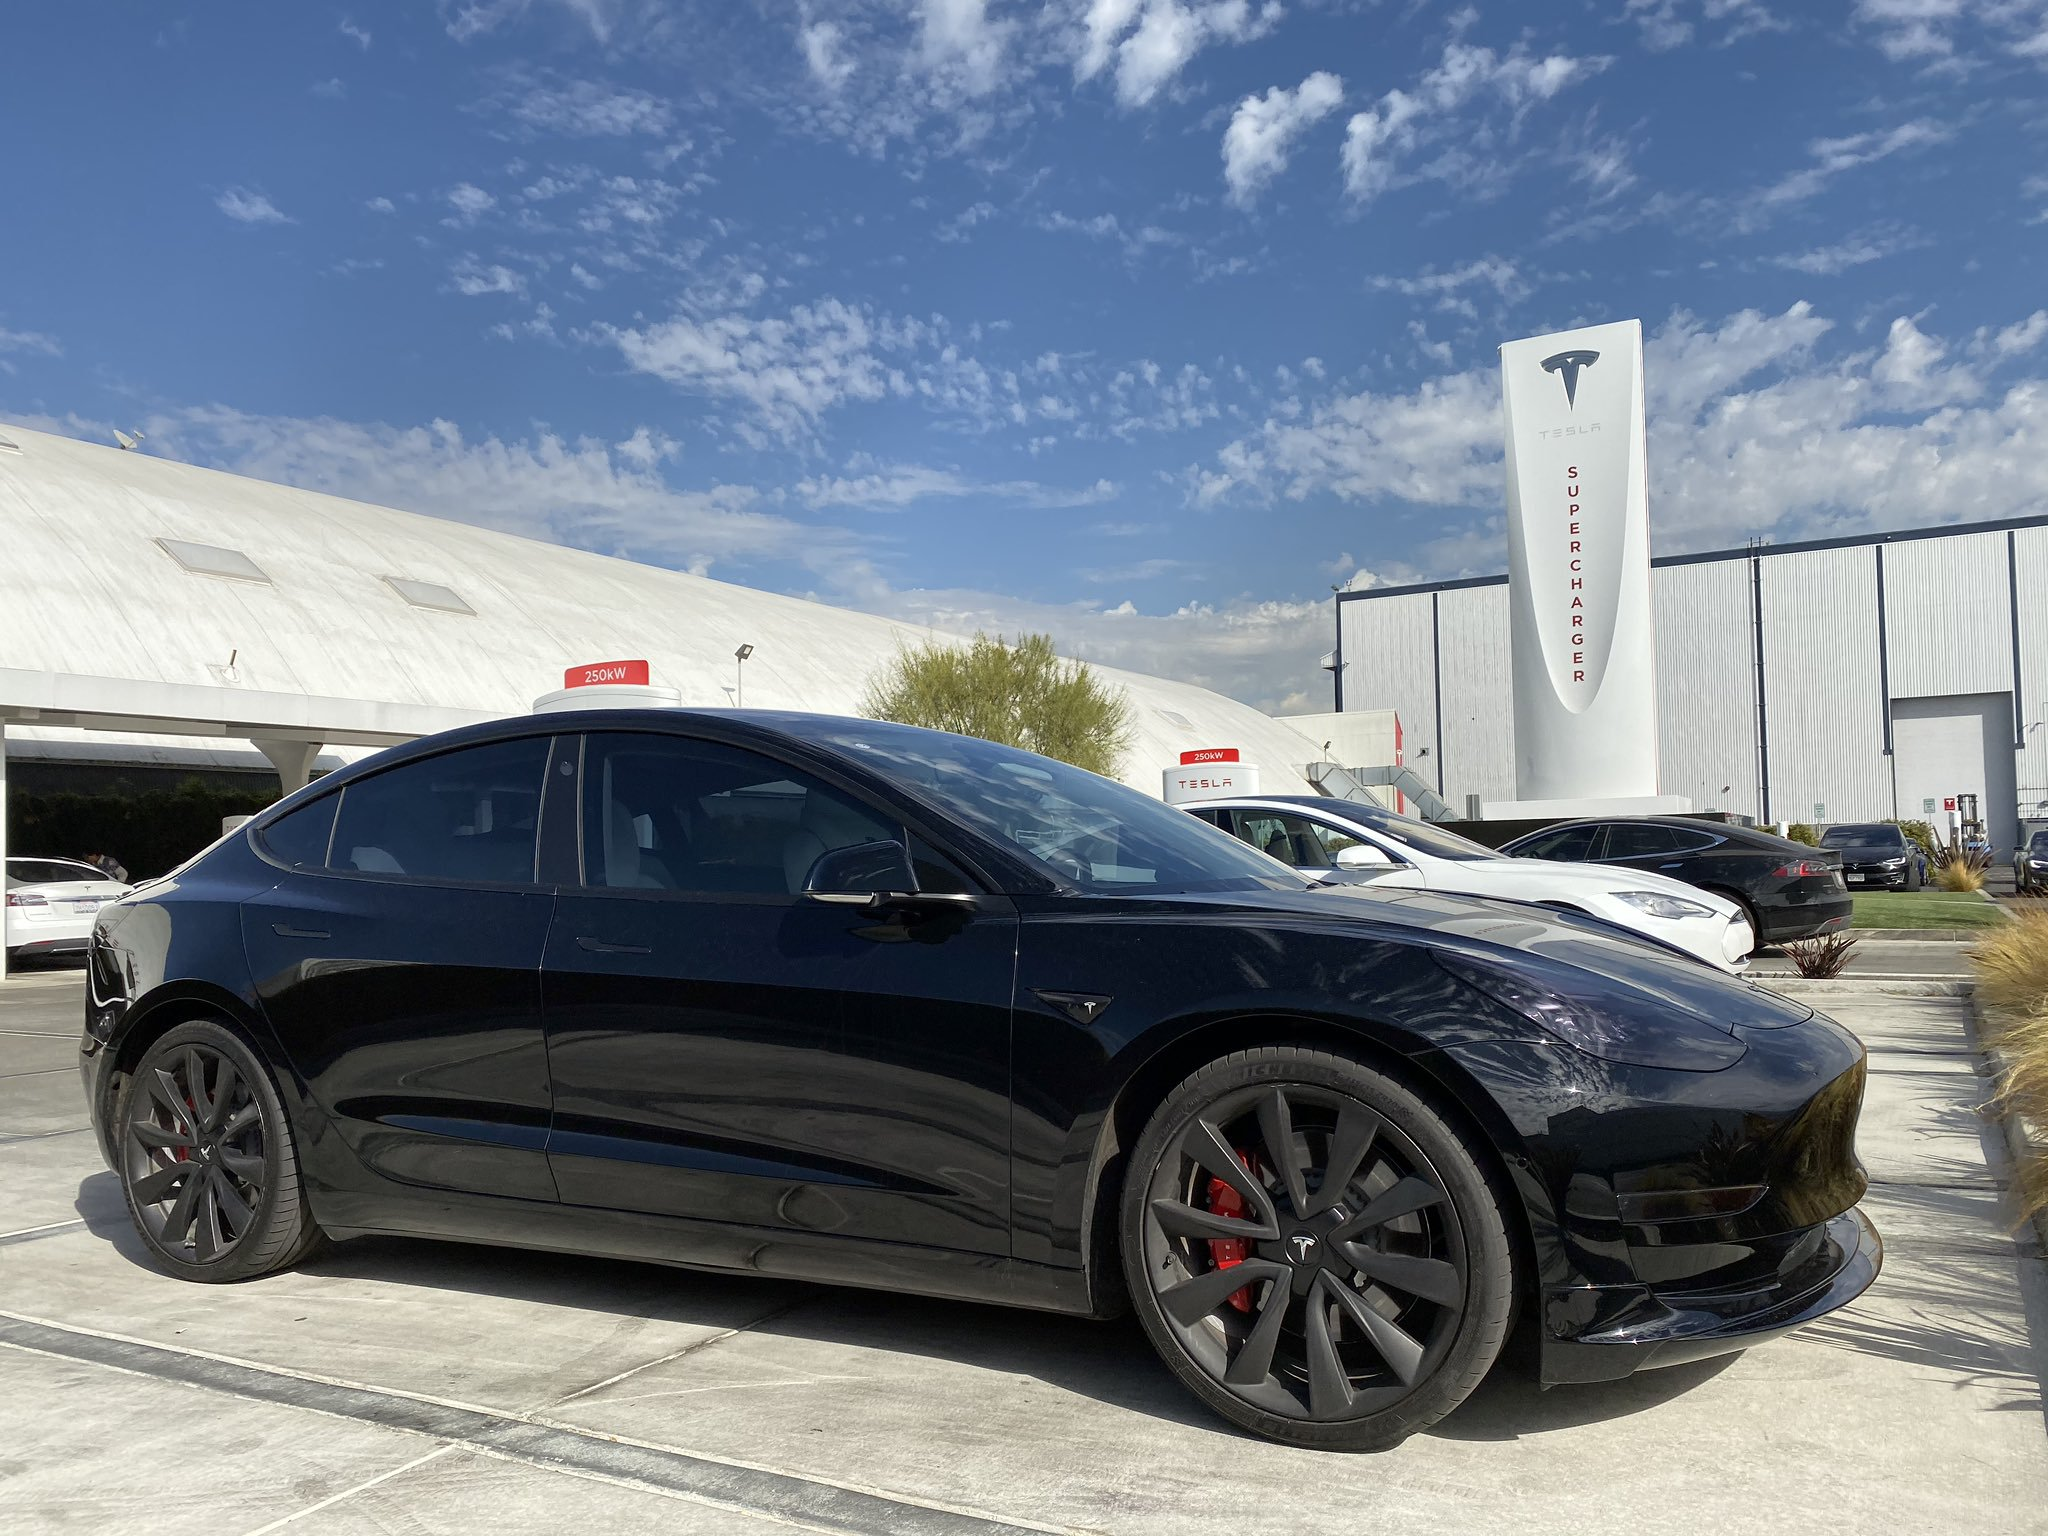 Photos: Why chrome delete your Model 3